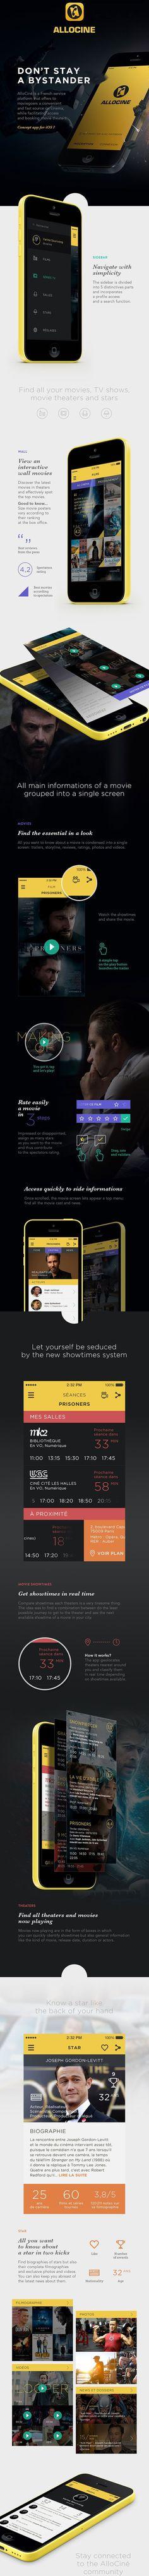 Inspiration Mobile #14 : comment présenter vos créations mobiles   Blog du Webdesign